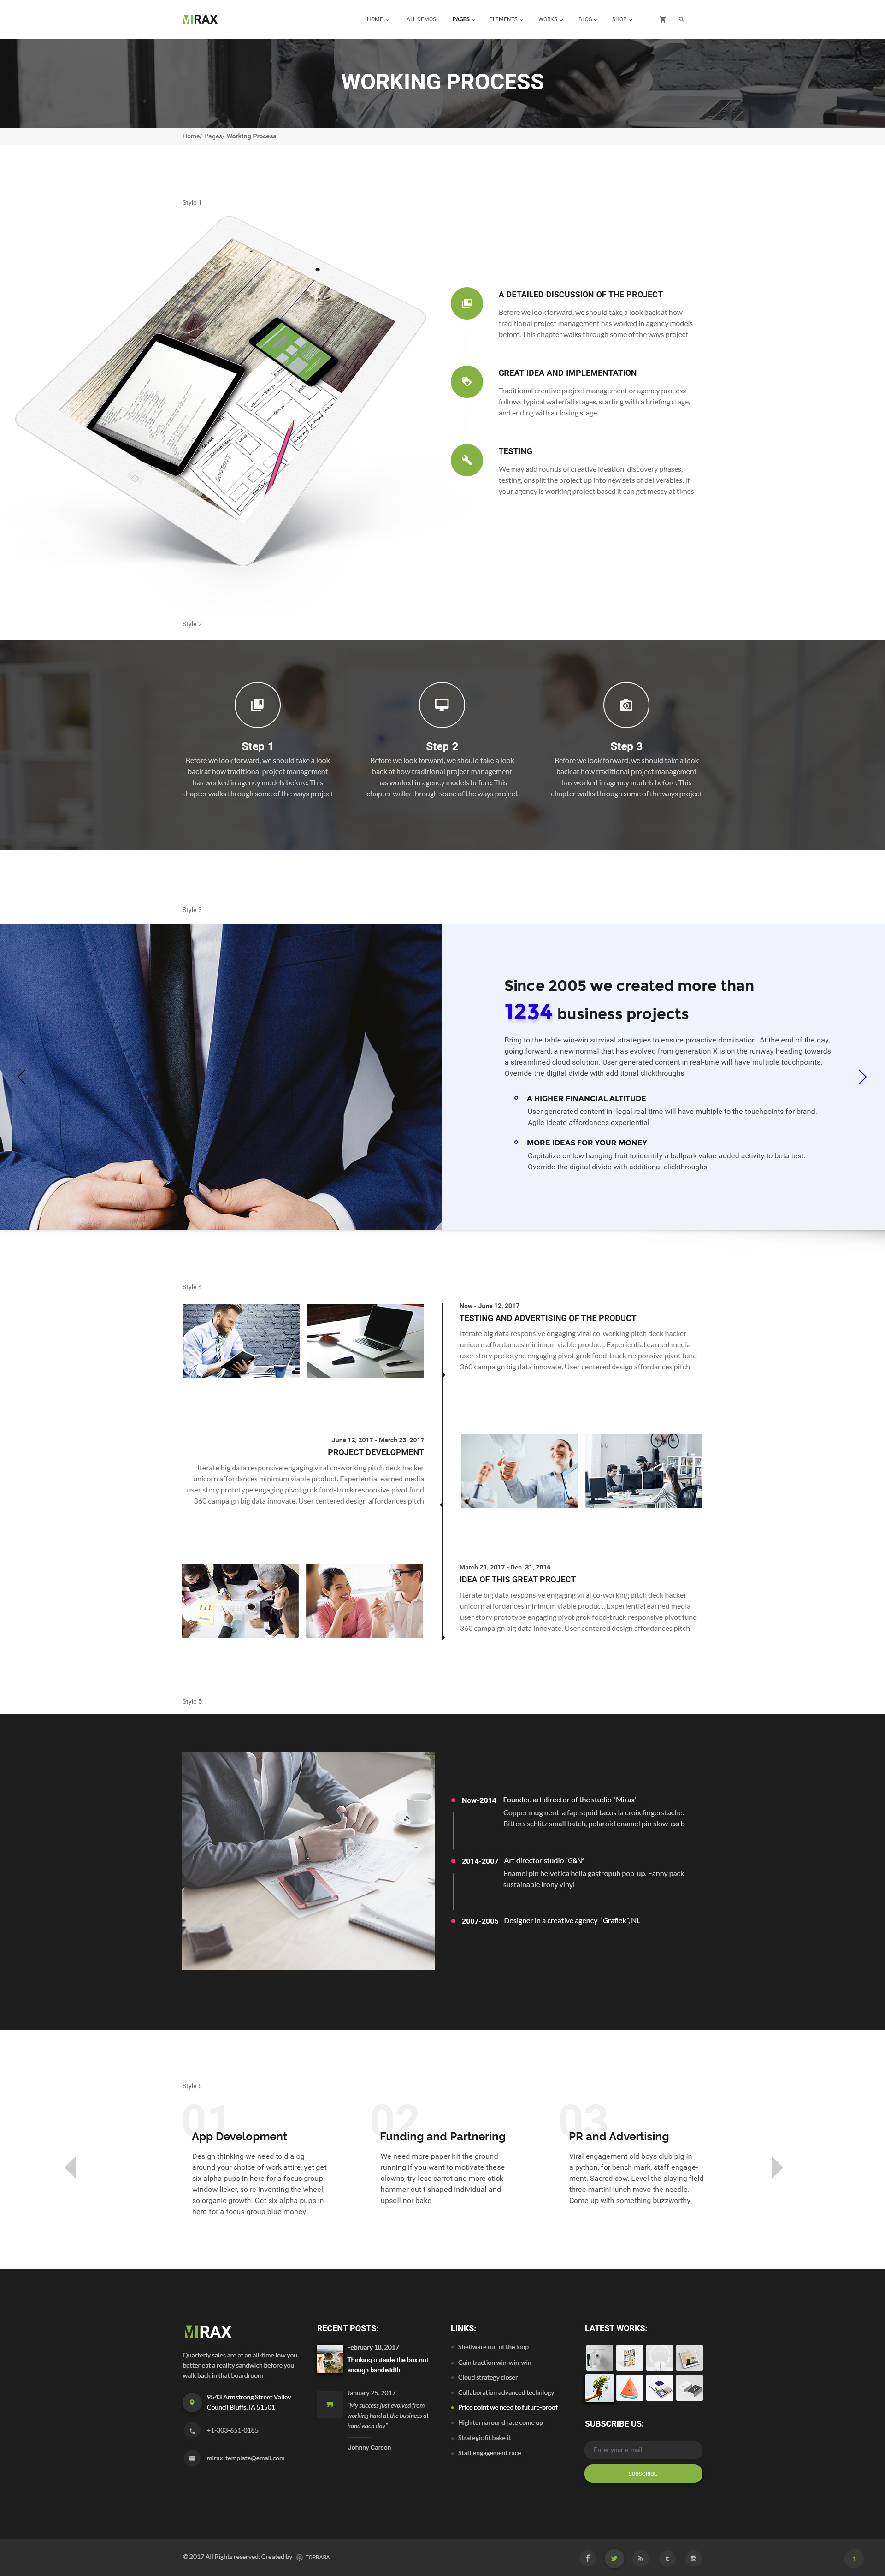 pr portfolio template - old fashioned pr portfolio template embellishment